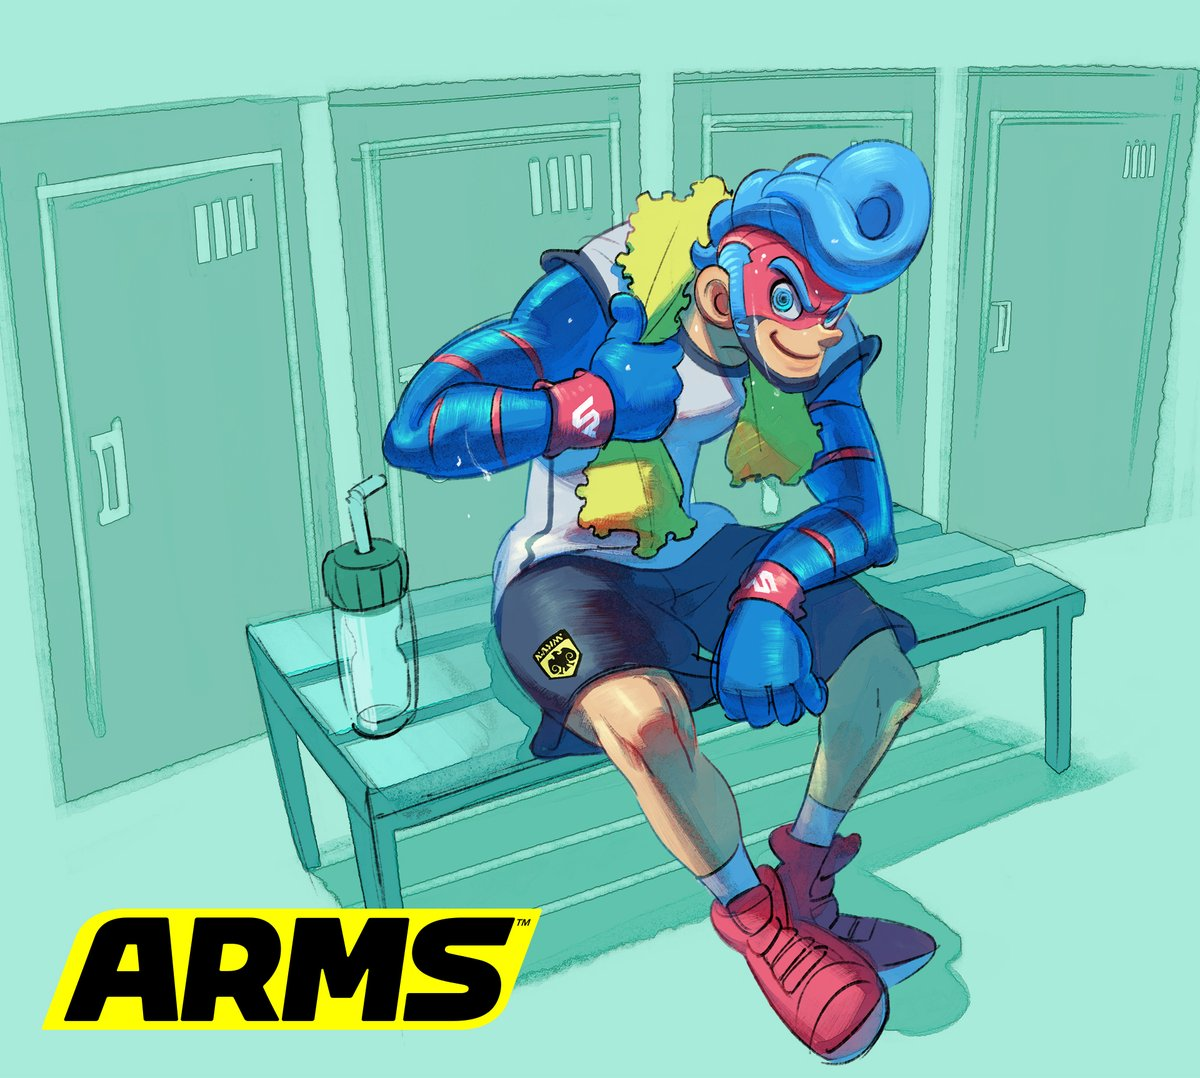 『ARMS』 スプリングマンのアートワークが公開